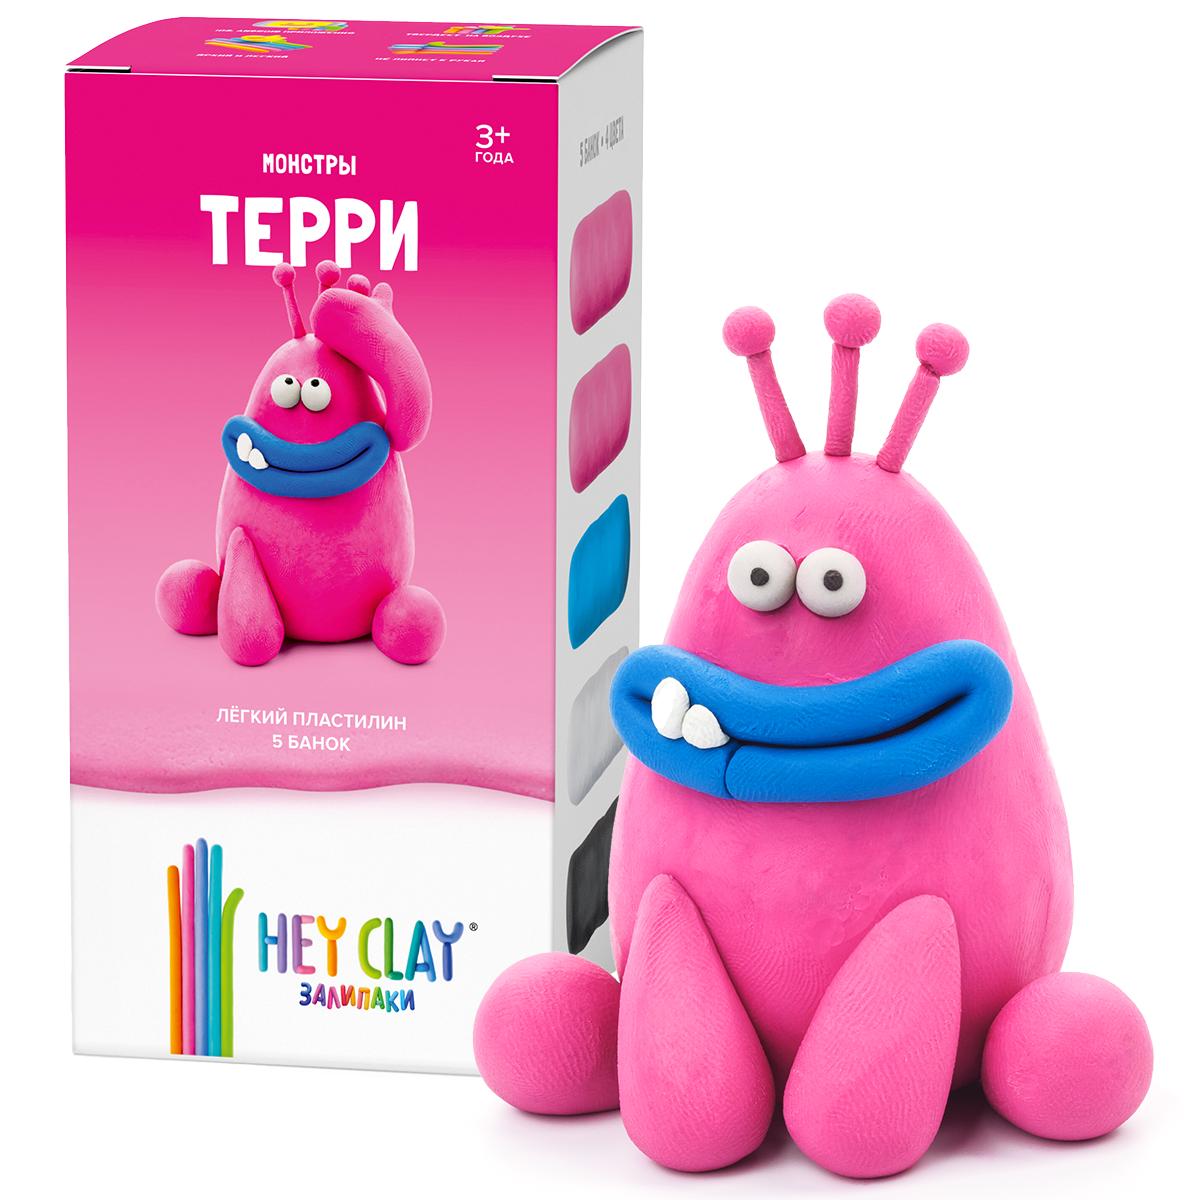 Легкий пластилин залипаки HEY CLAY - Терри